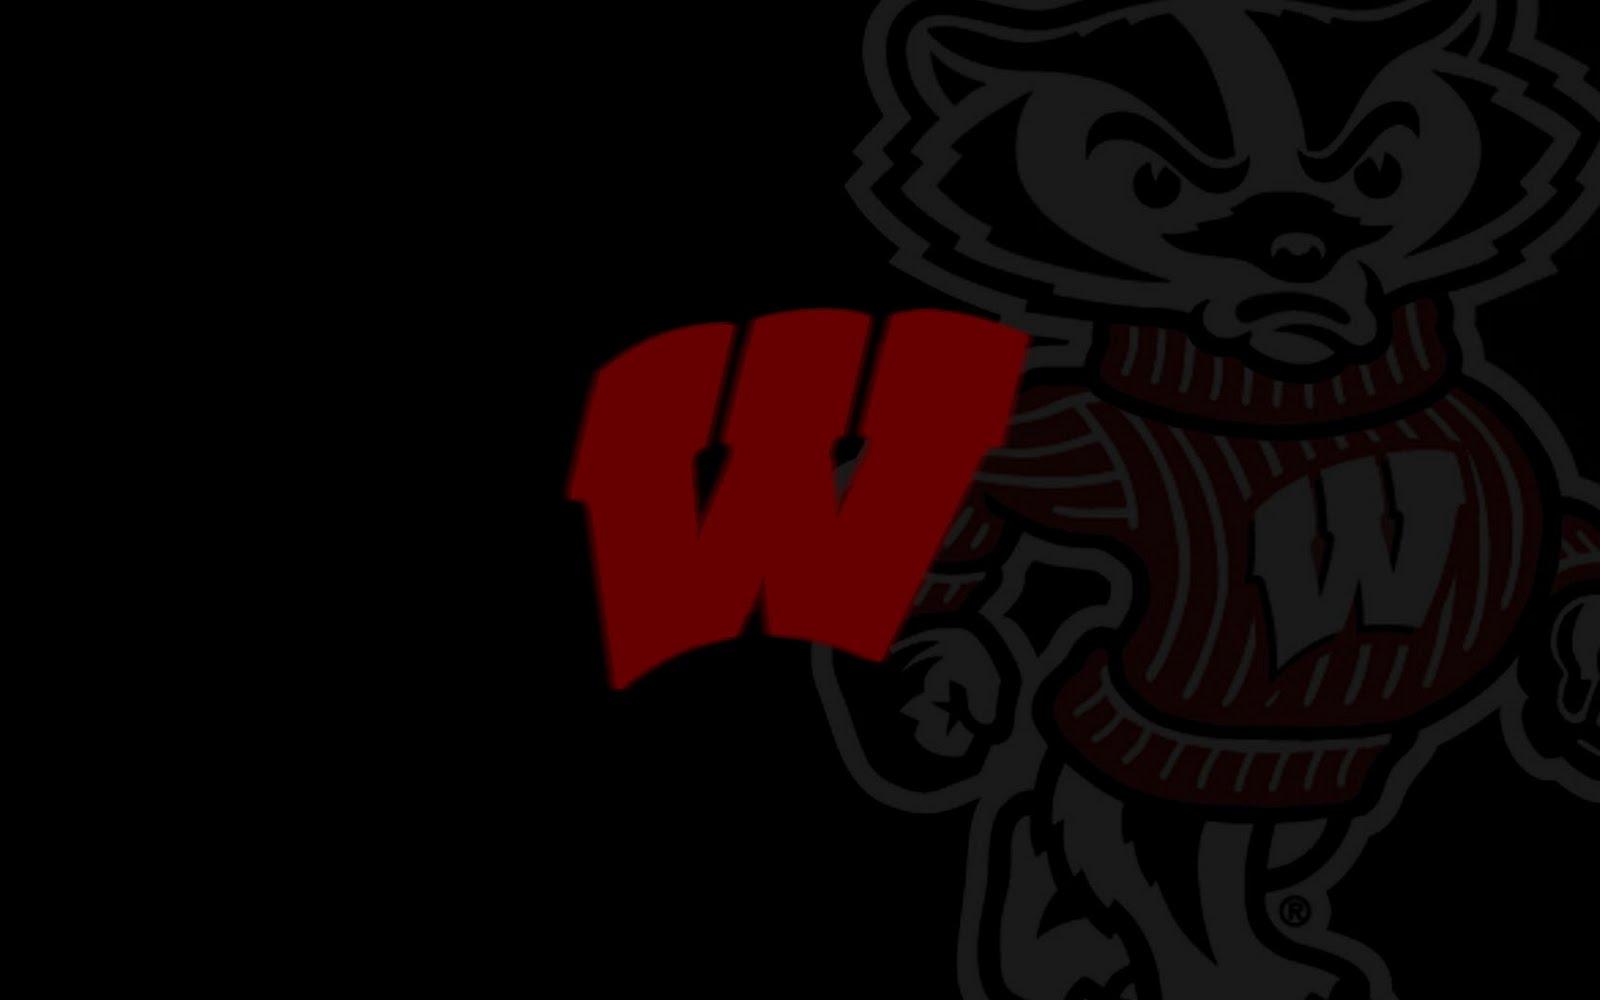 49+] Wisconsin Badger Wallpapers Free